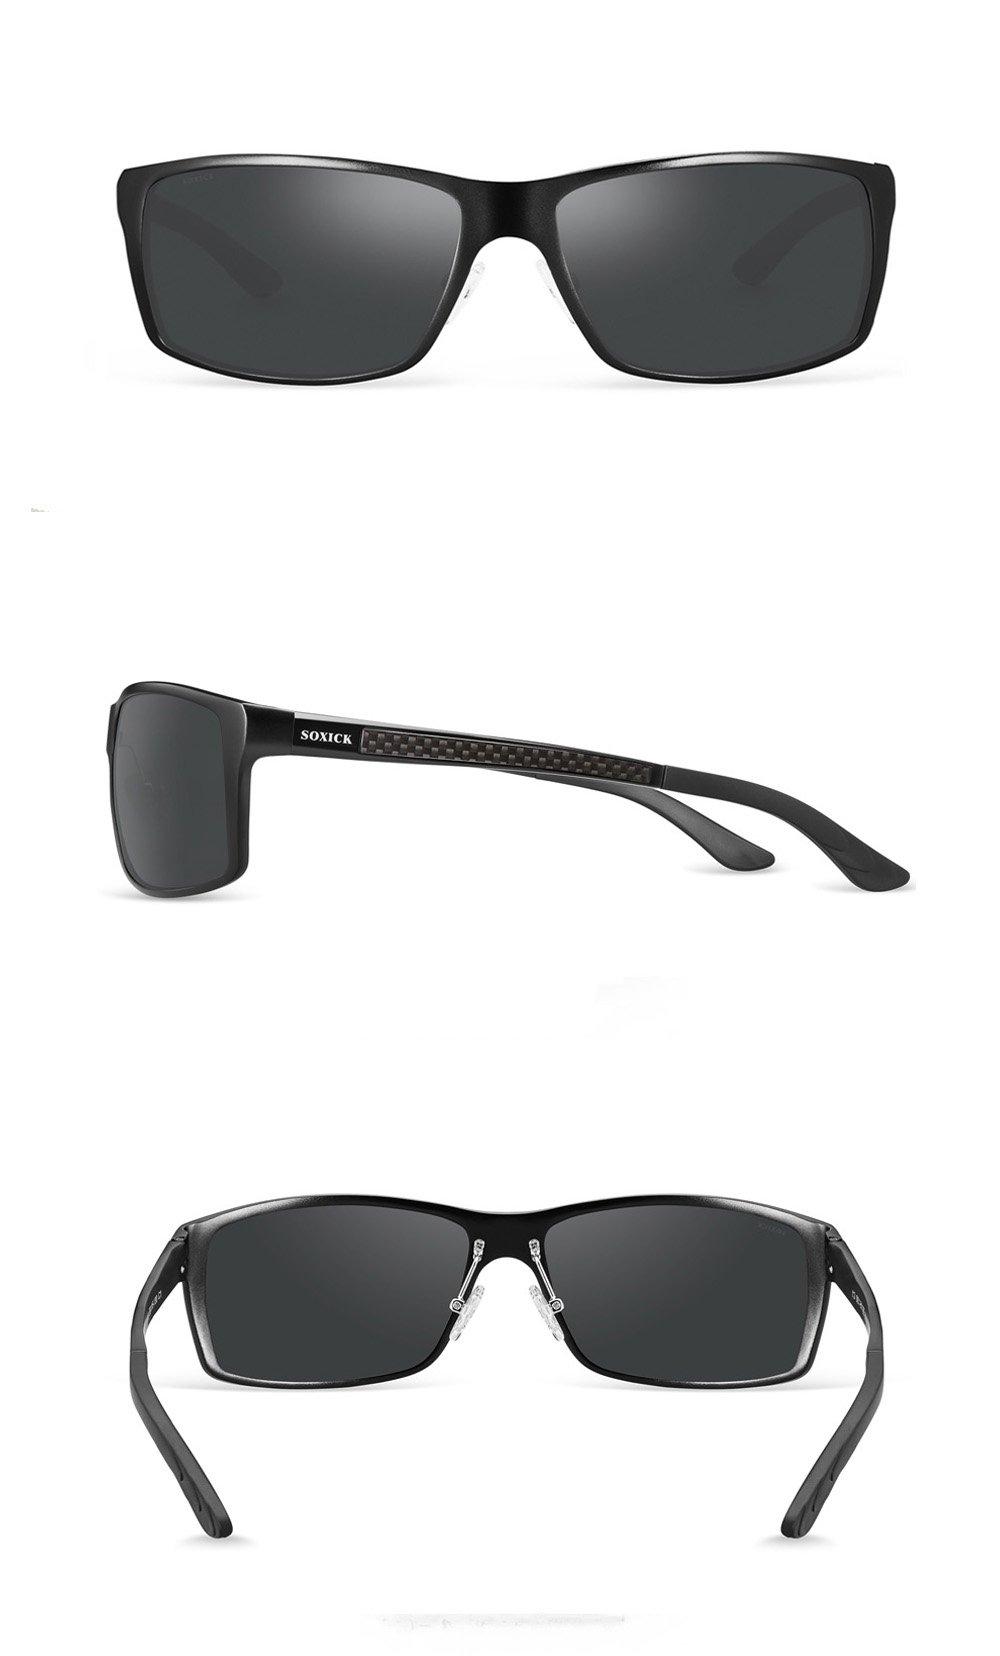 21a0f85a7ab Soxick UV400 Polarized Sunglasses for Men Wayfarer Men s Driving Sunglasses  - 999   Sunglasses   Clothing